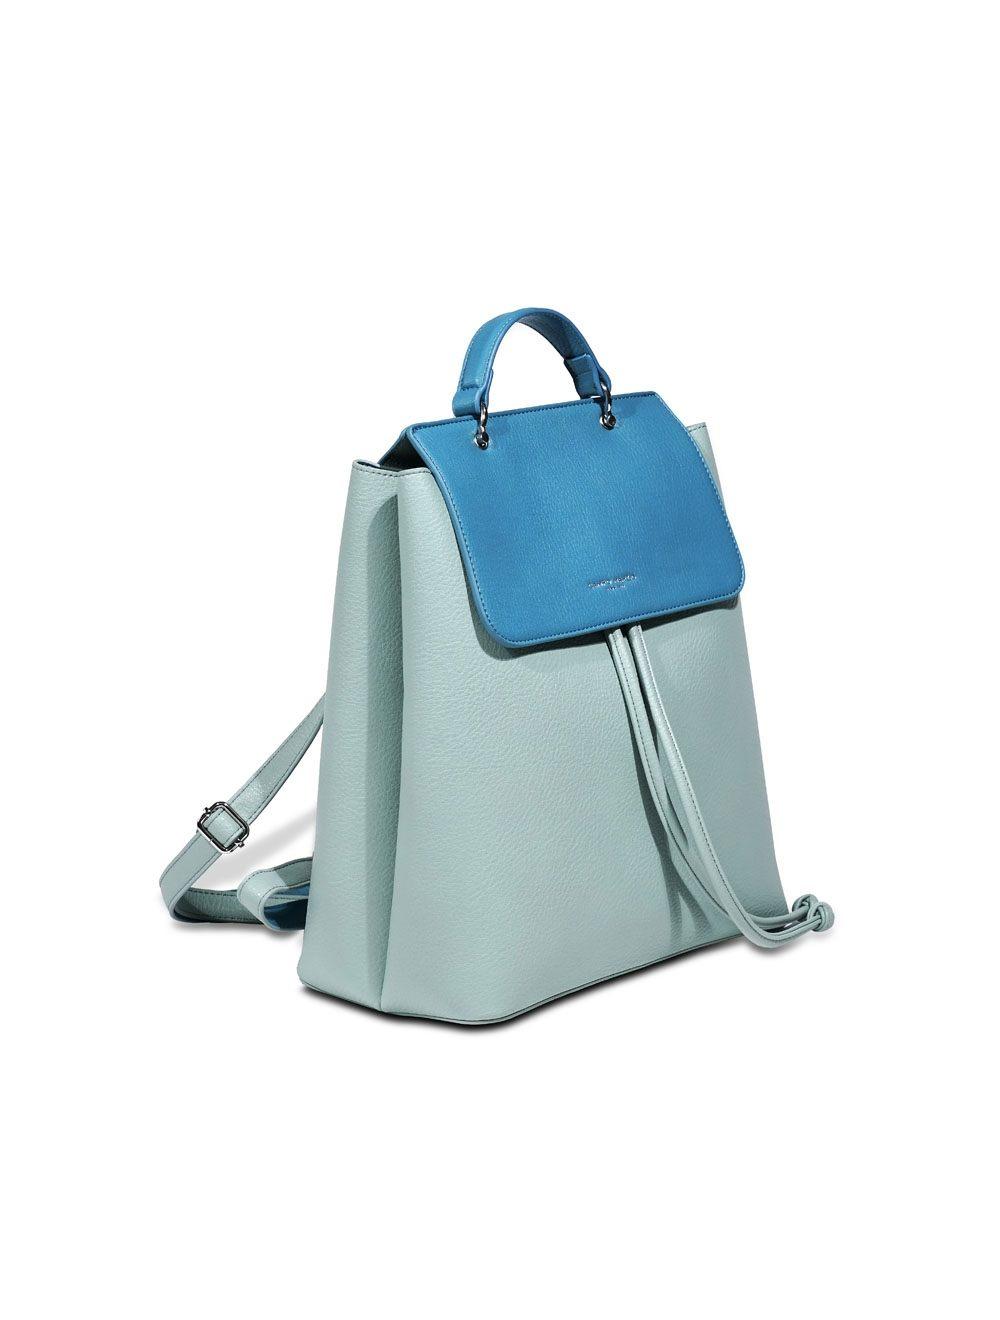 Fannie Backpack Handbag - Mint